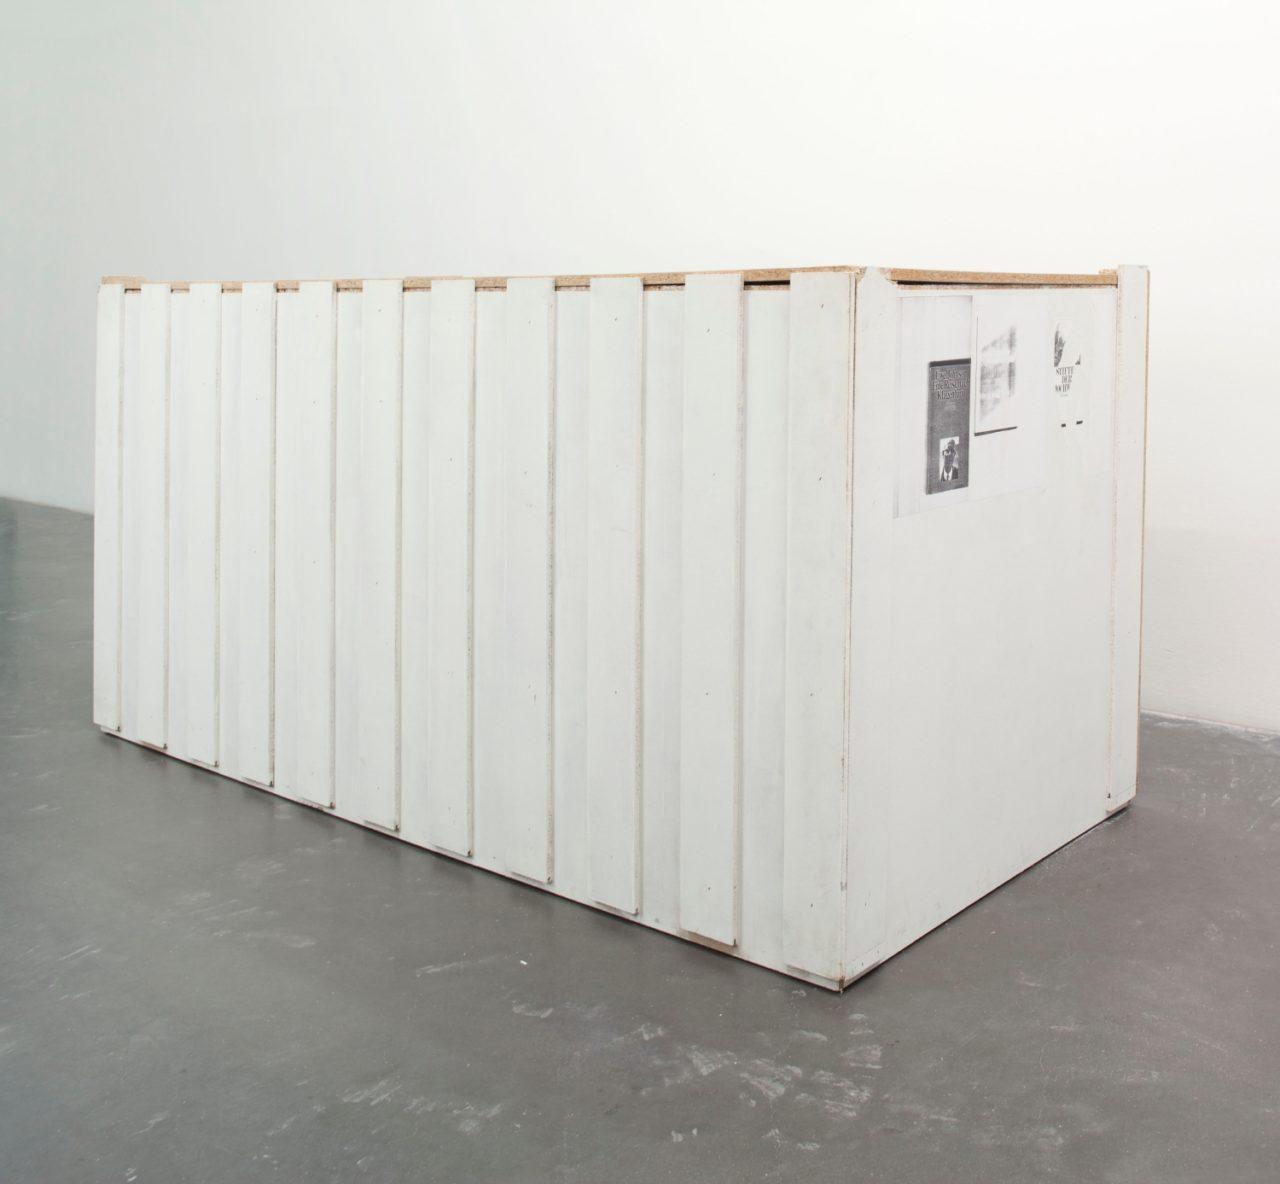 Manfred Pernice, Bell II, 11 (1998)